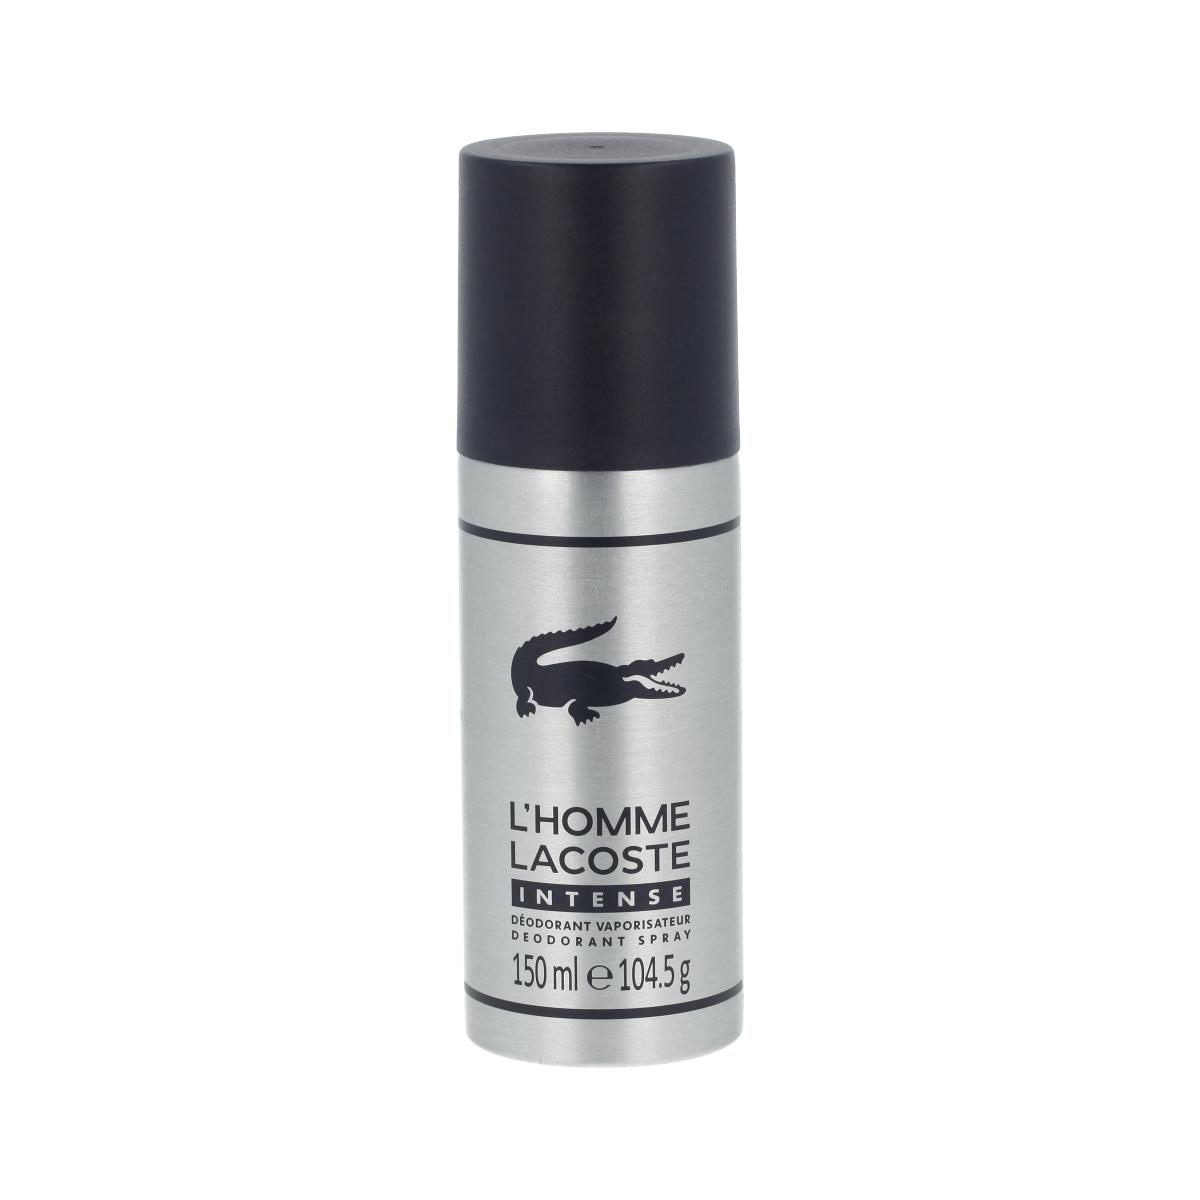 Lacoste L'Homme Intense Deodorant im Spray 150 ml (man) 17741